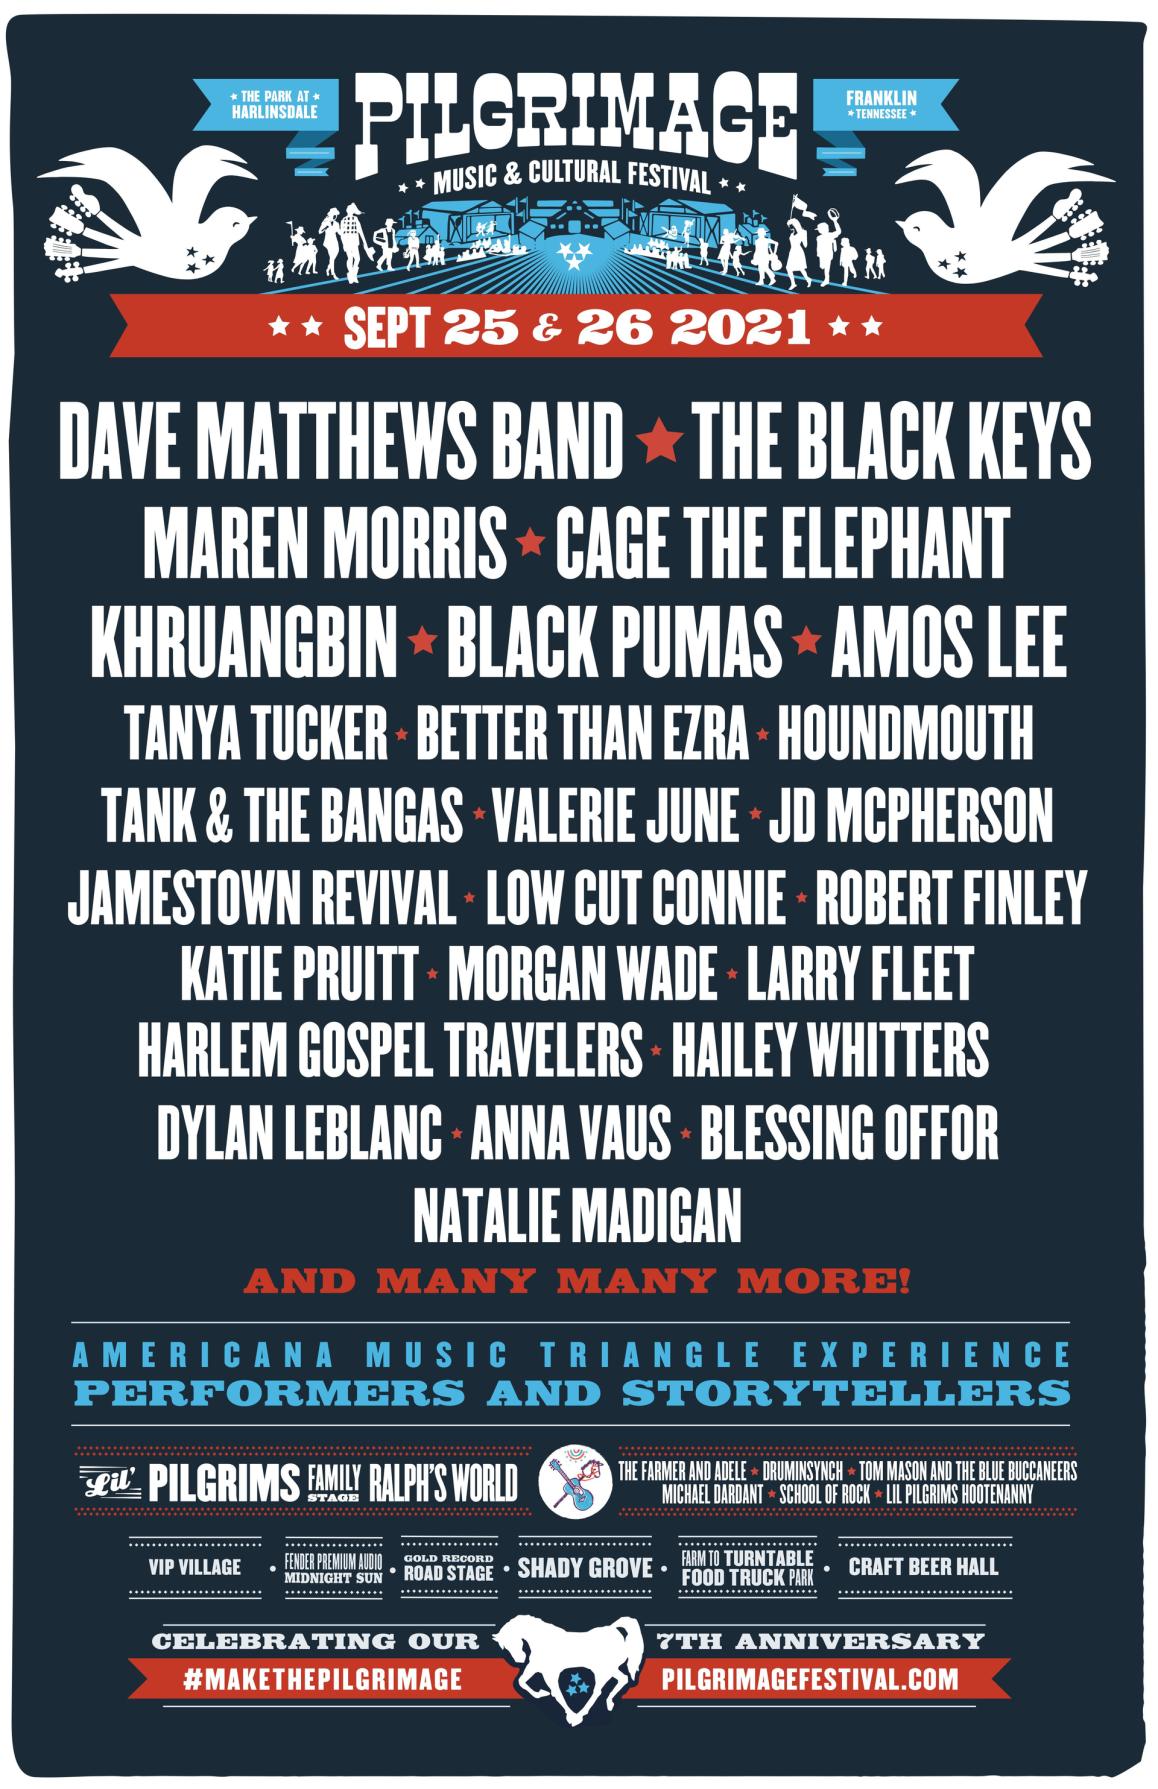 Maren Morris, The Black Keys, Dave Matthews Band Top Initial Pilgrimage Lineup